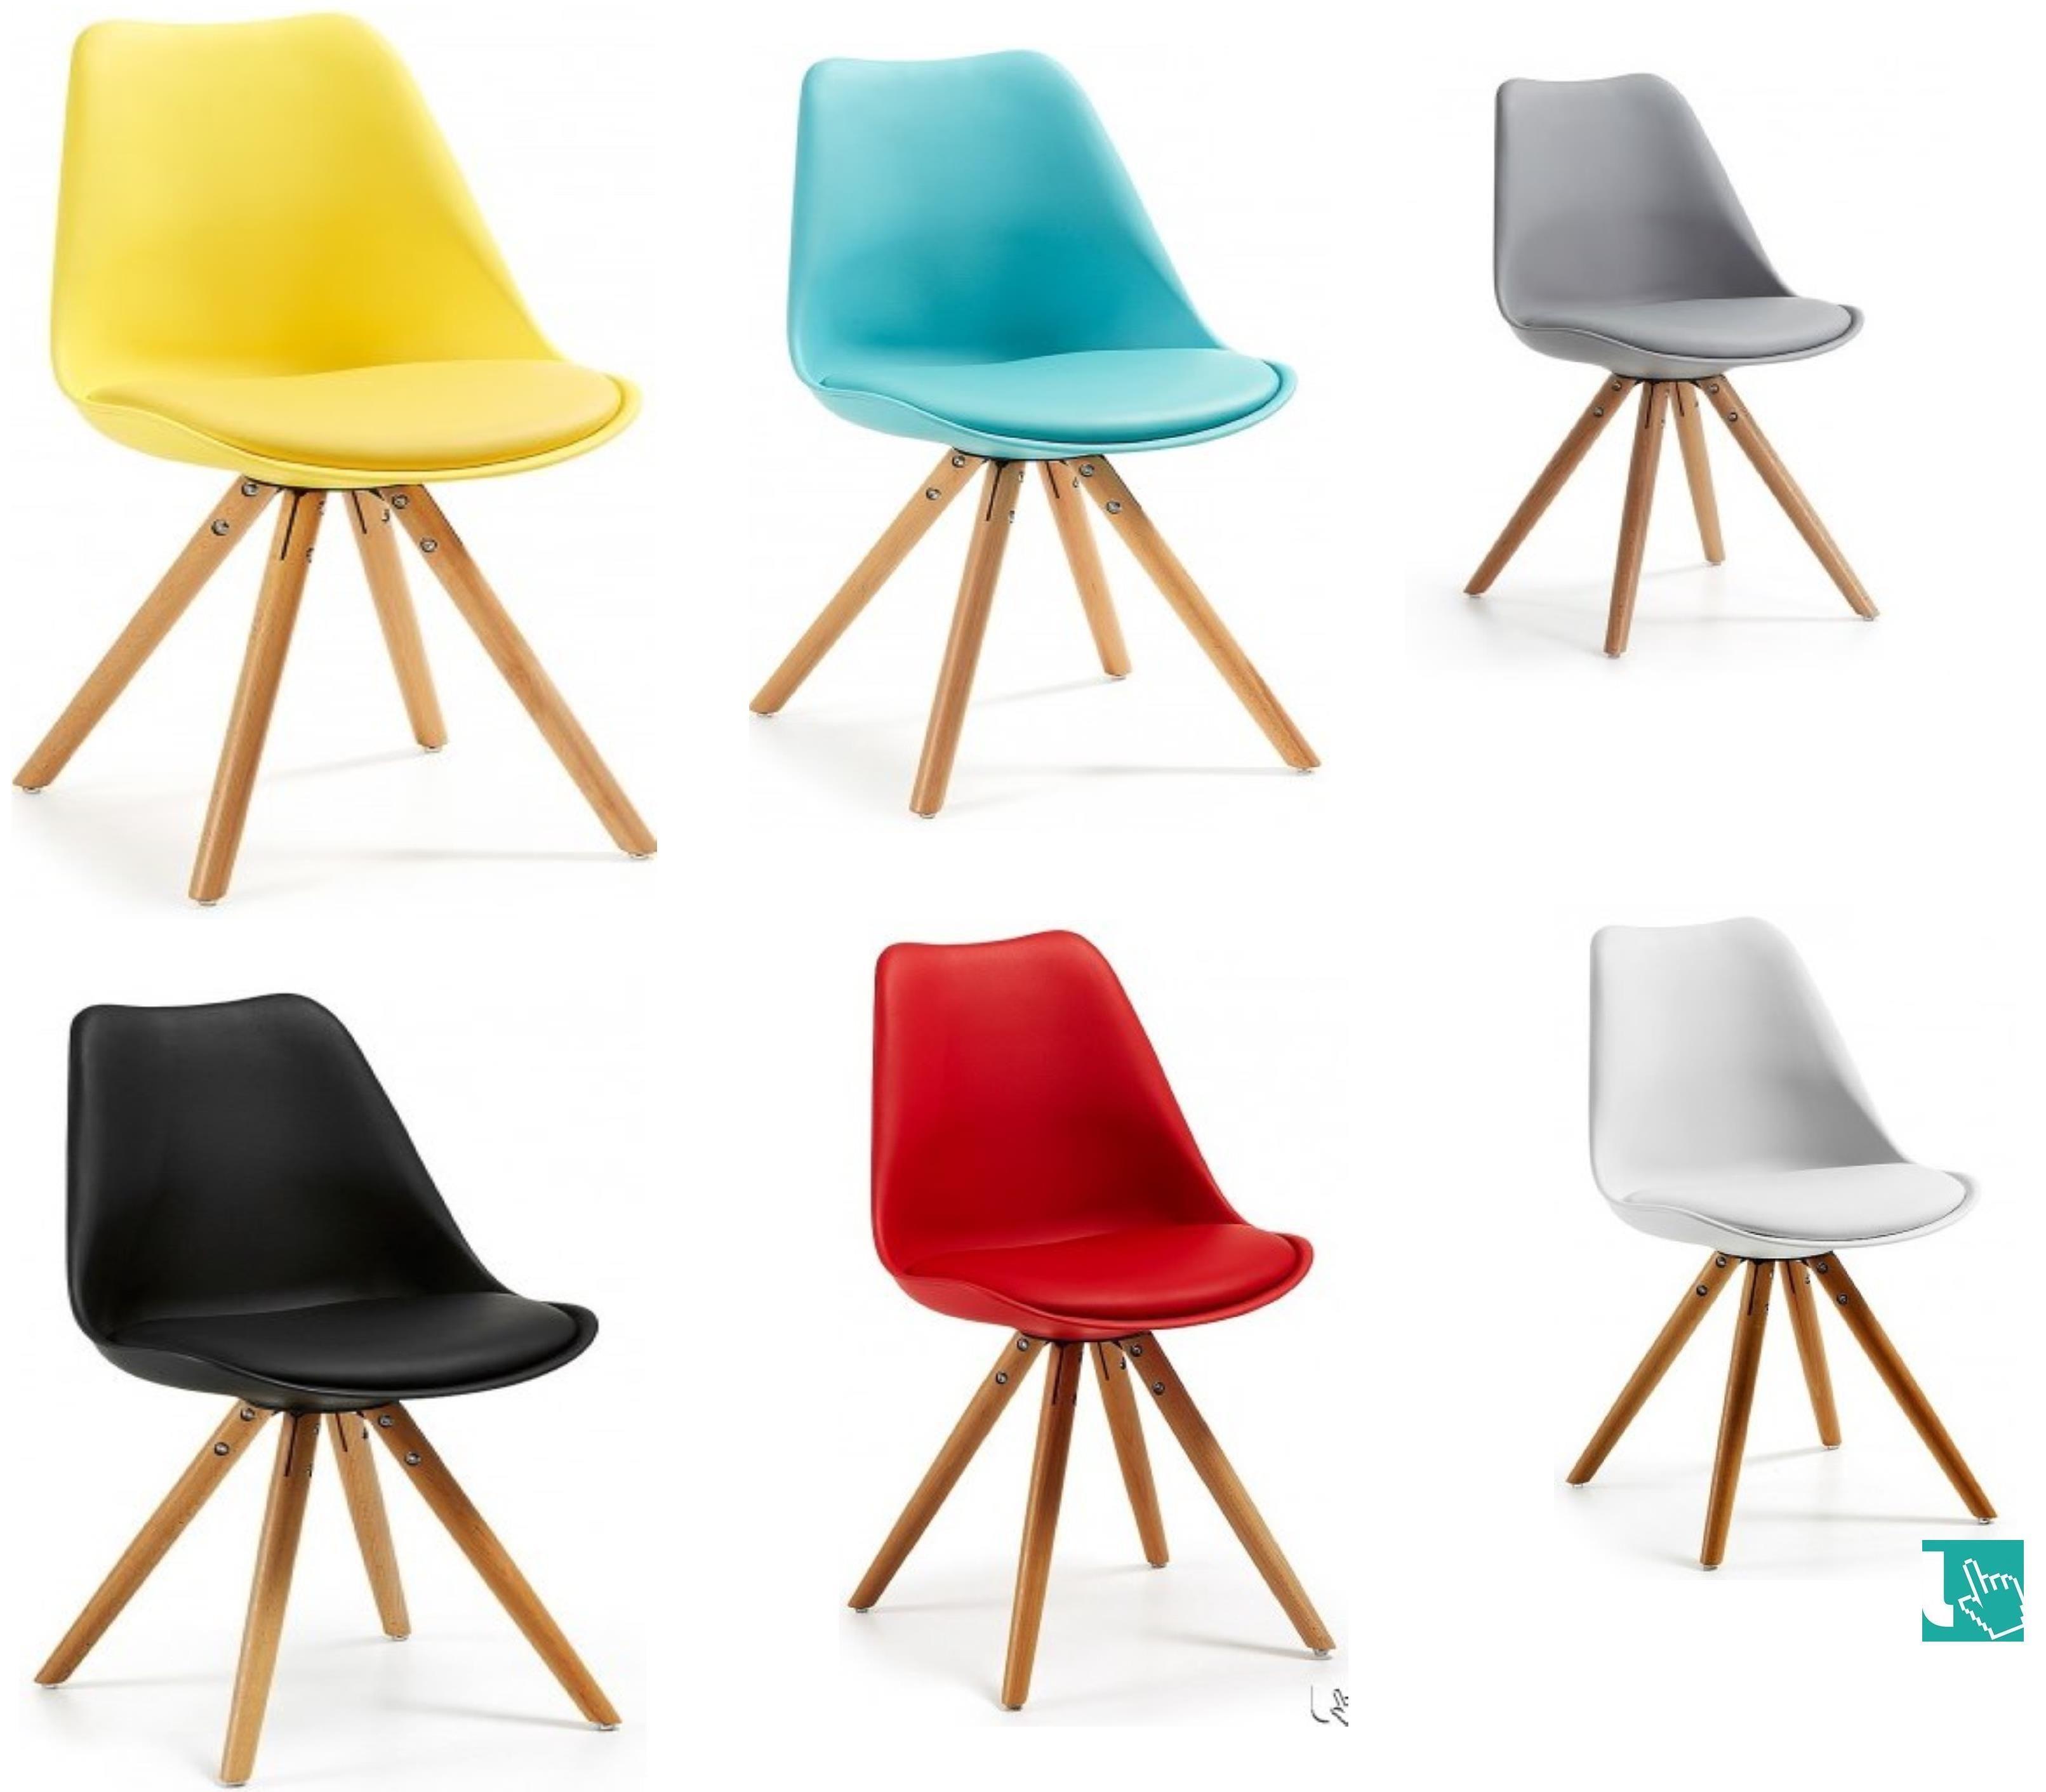 Sedie In Ecopelle Colorate.Sedia Colorata In Stile Scandinavo Linee Semplici Geometrie